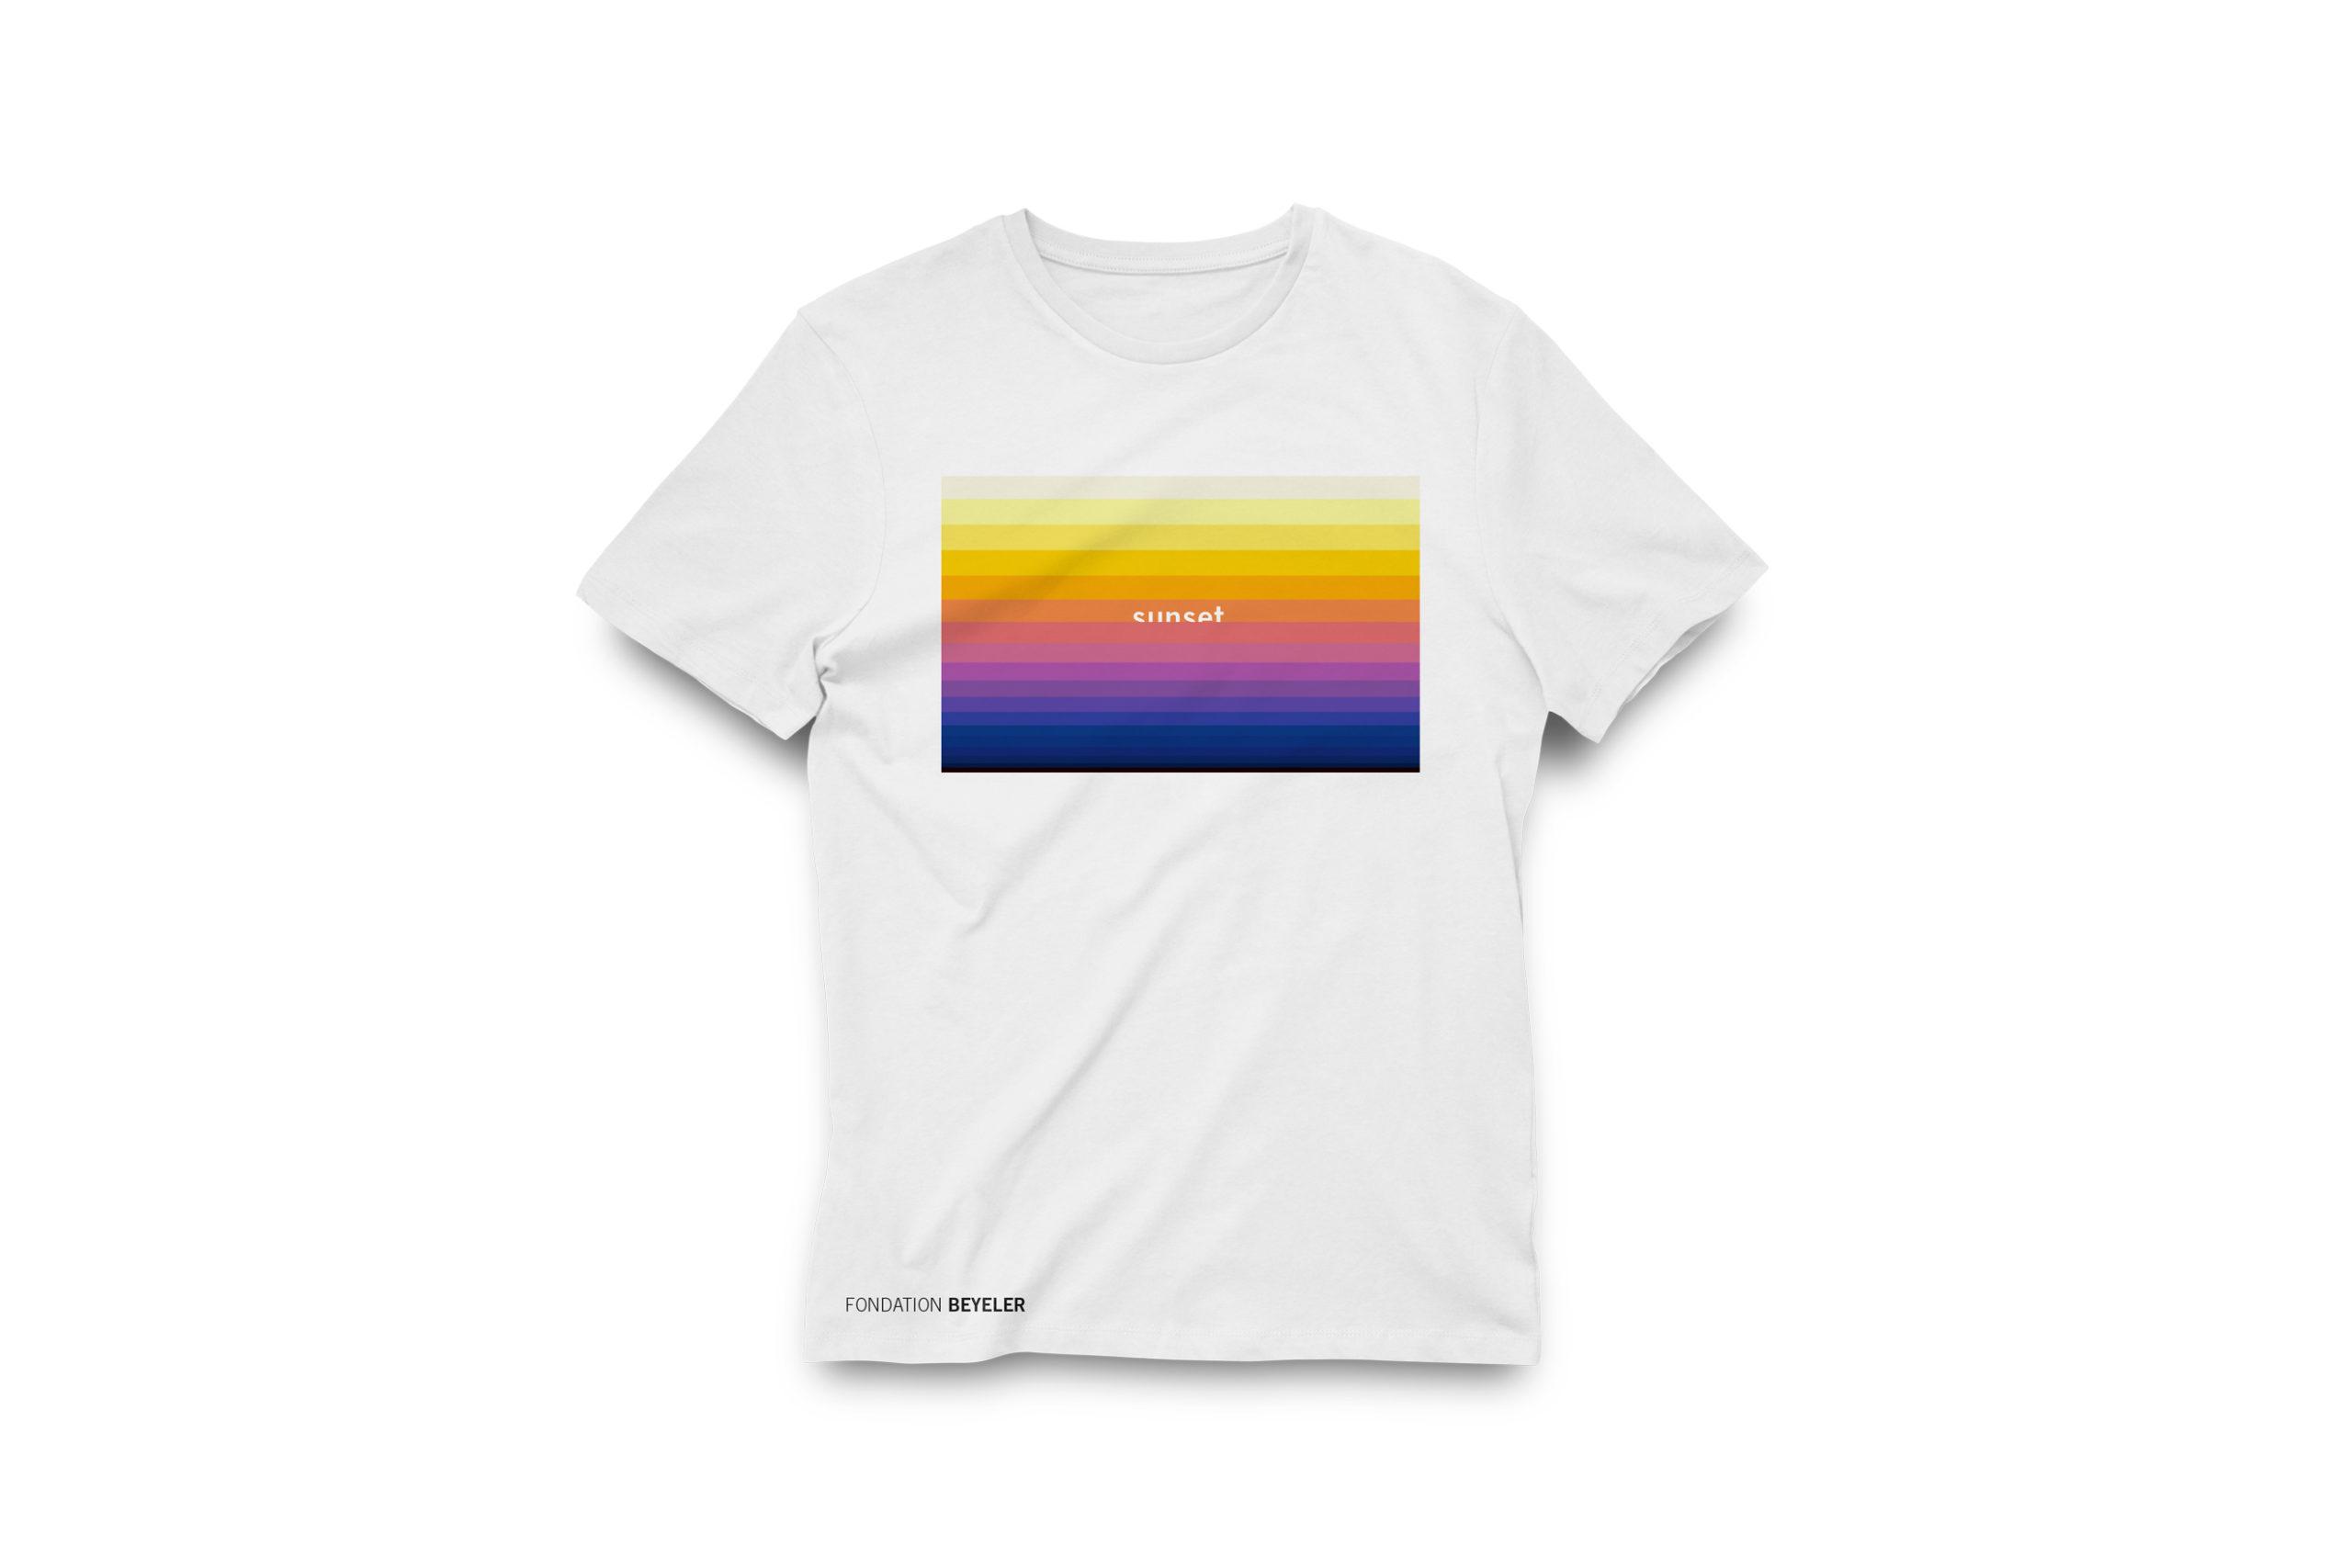 sunsetshirt